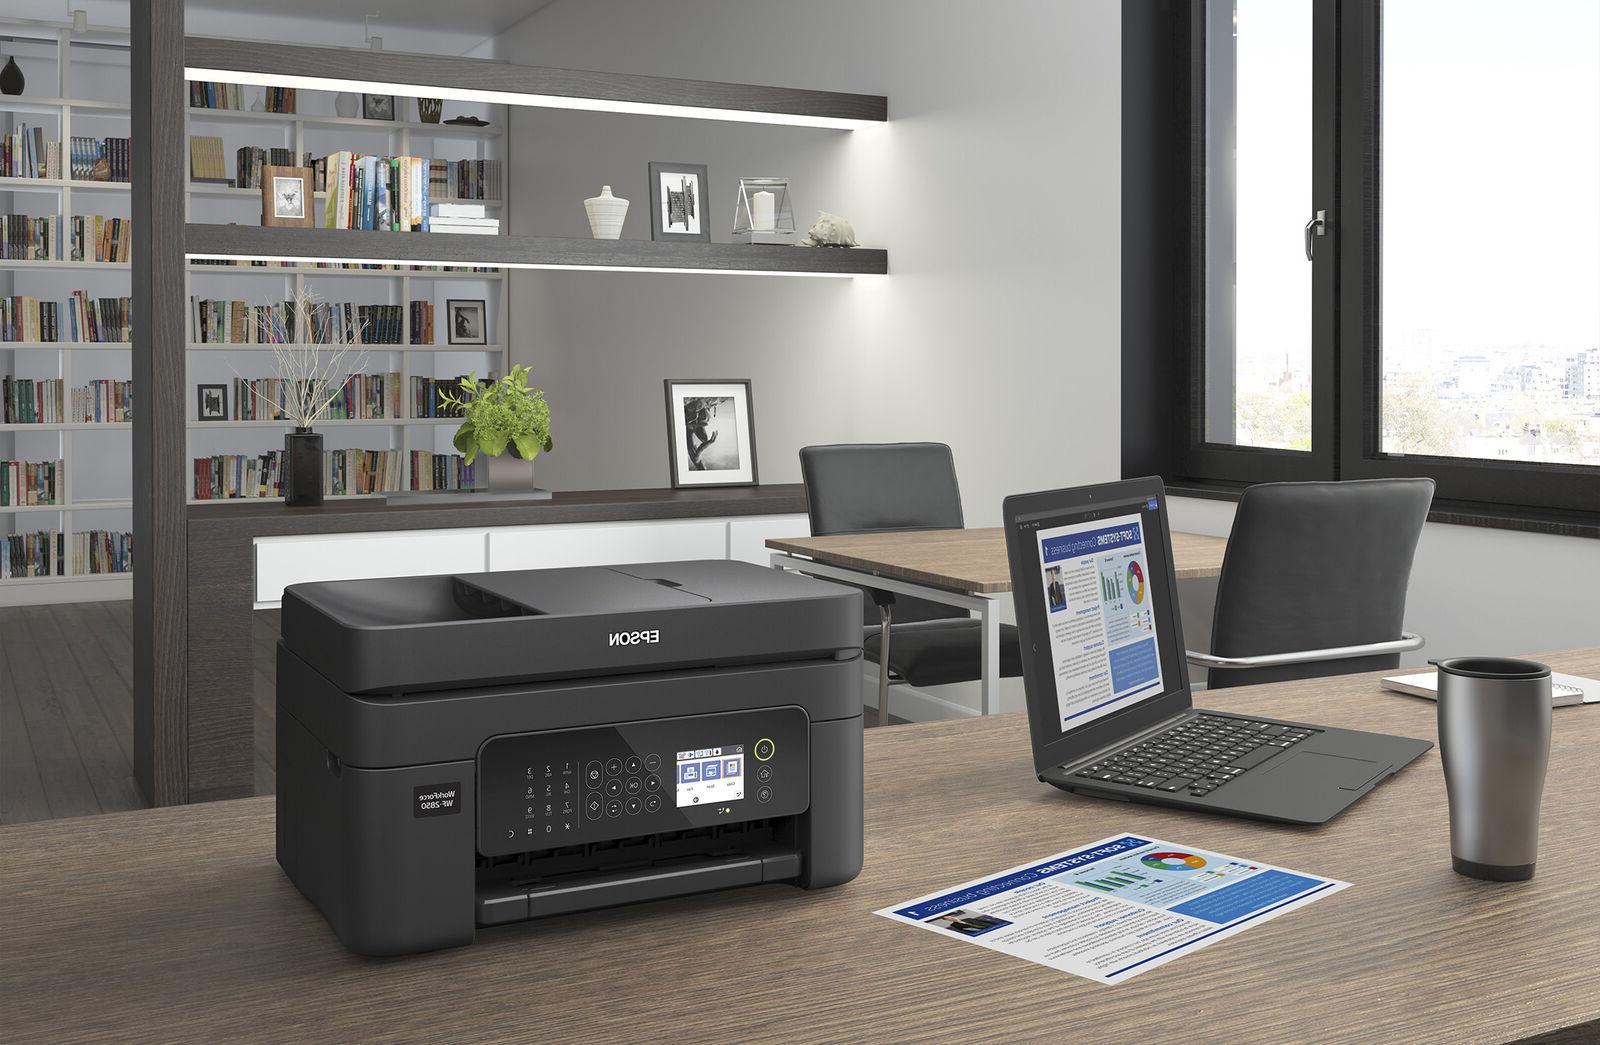 Epson Printer Fax Home Office WiFi